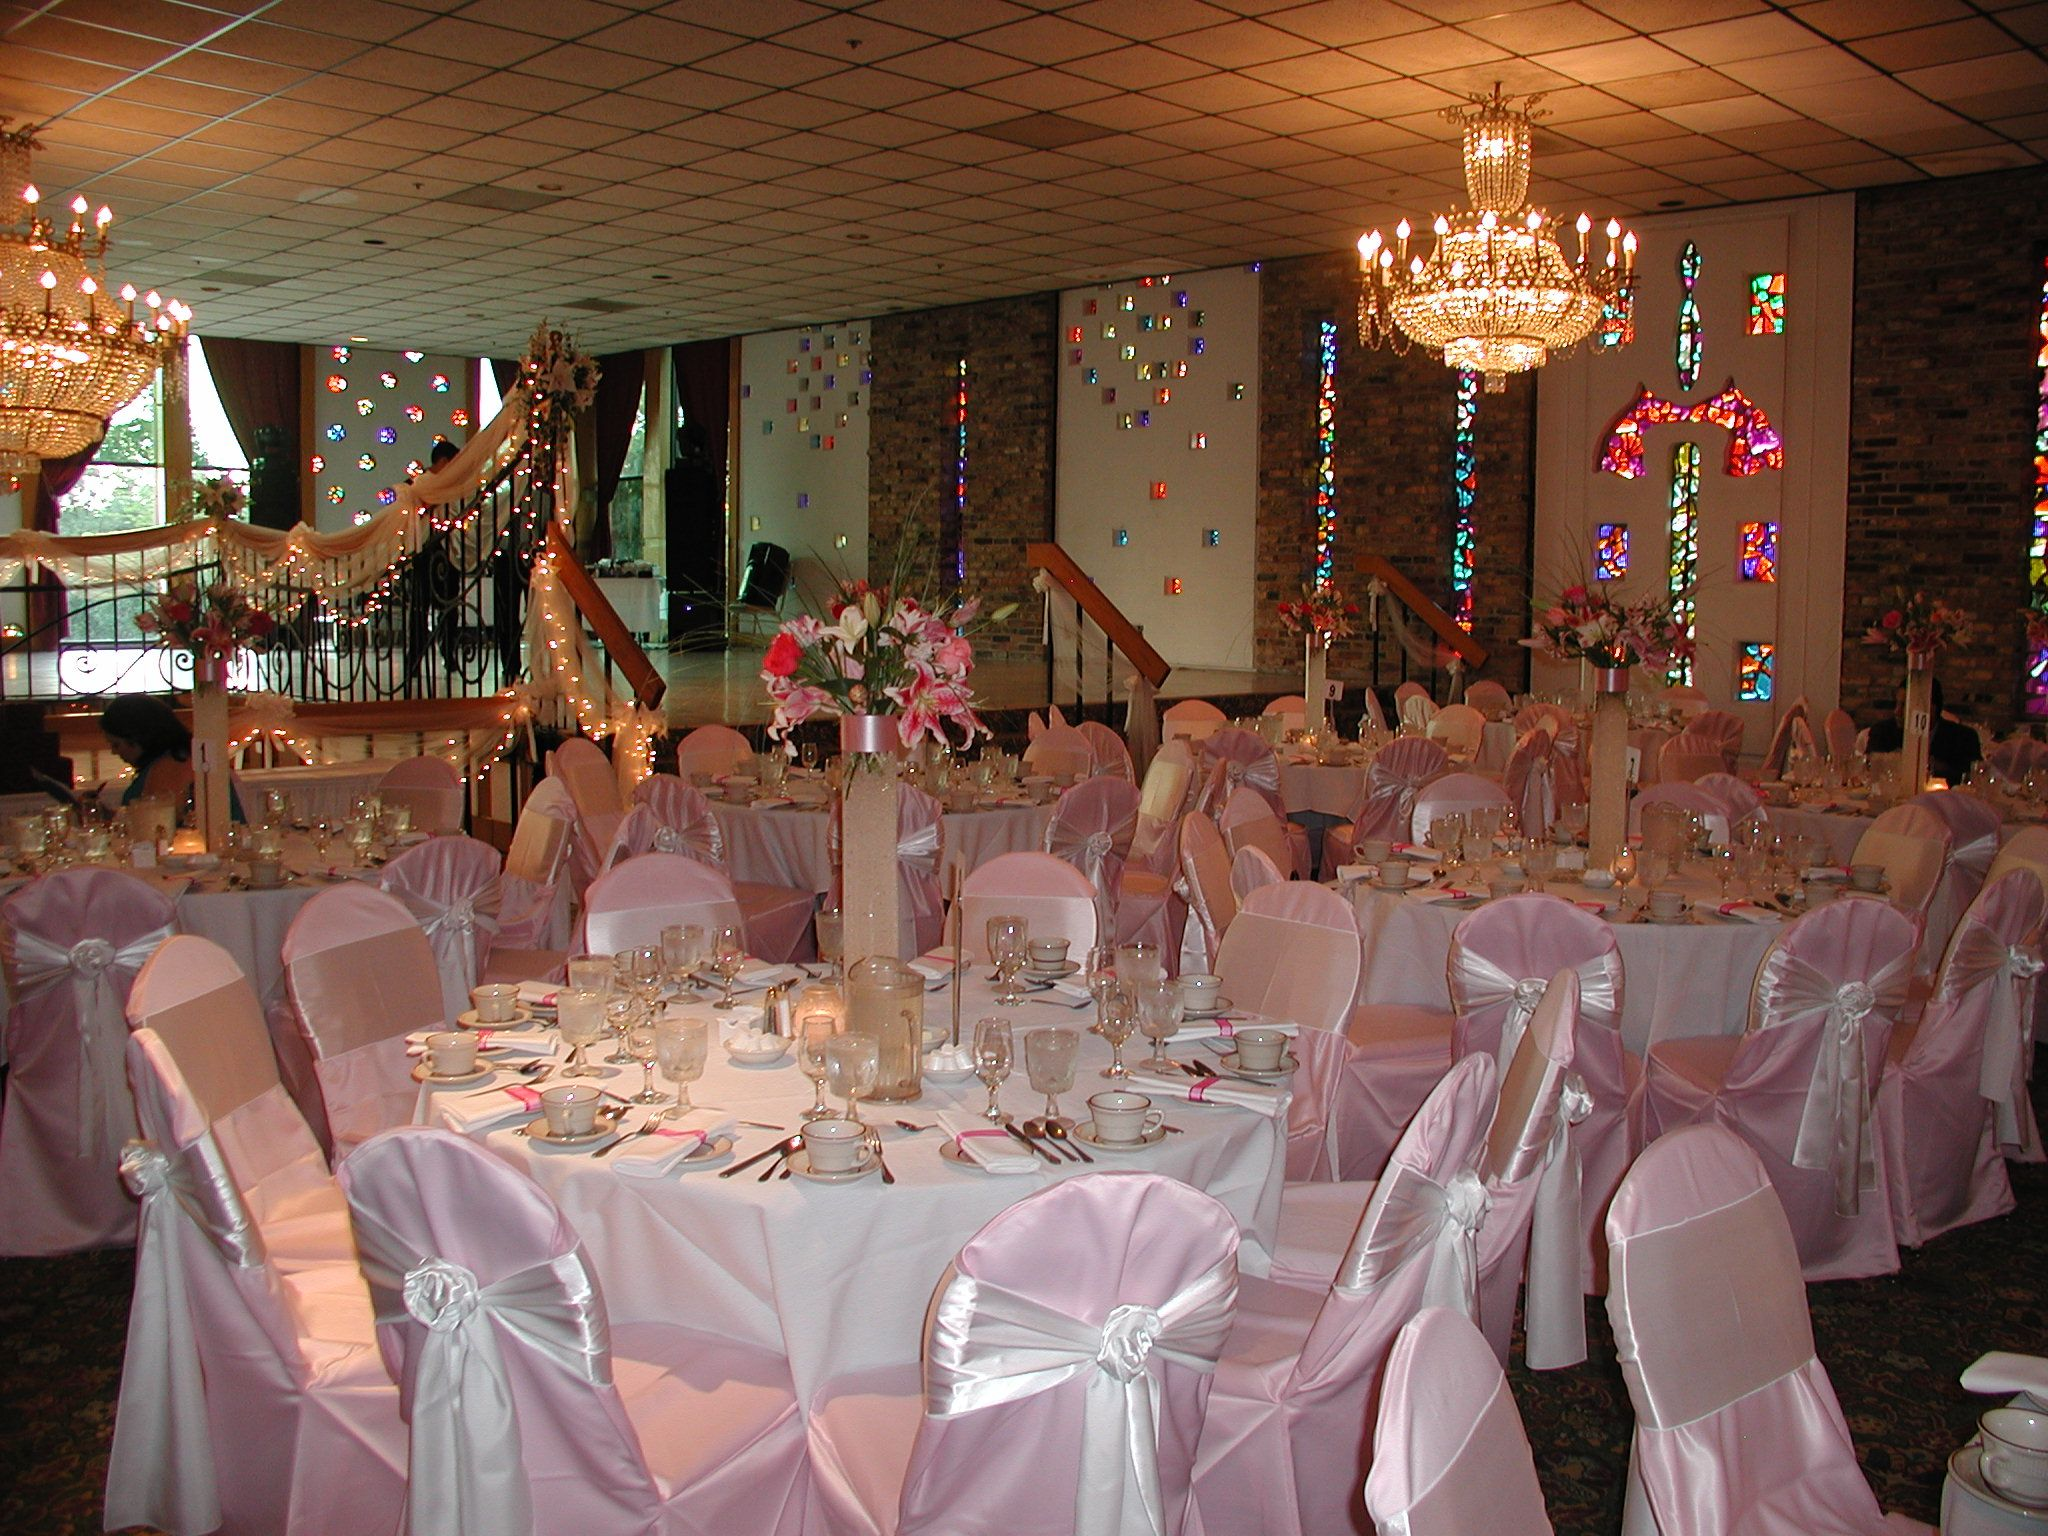 Berwyn Il Chicago Wedding Venues Western Suburbs Pinterest Banquet And